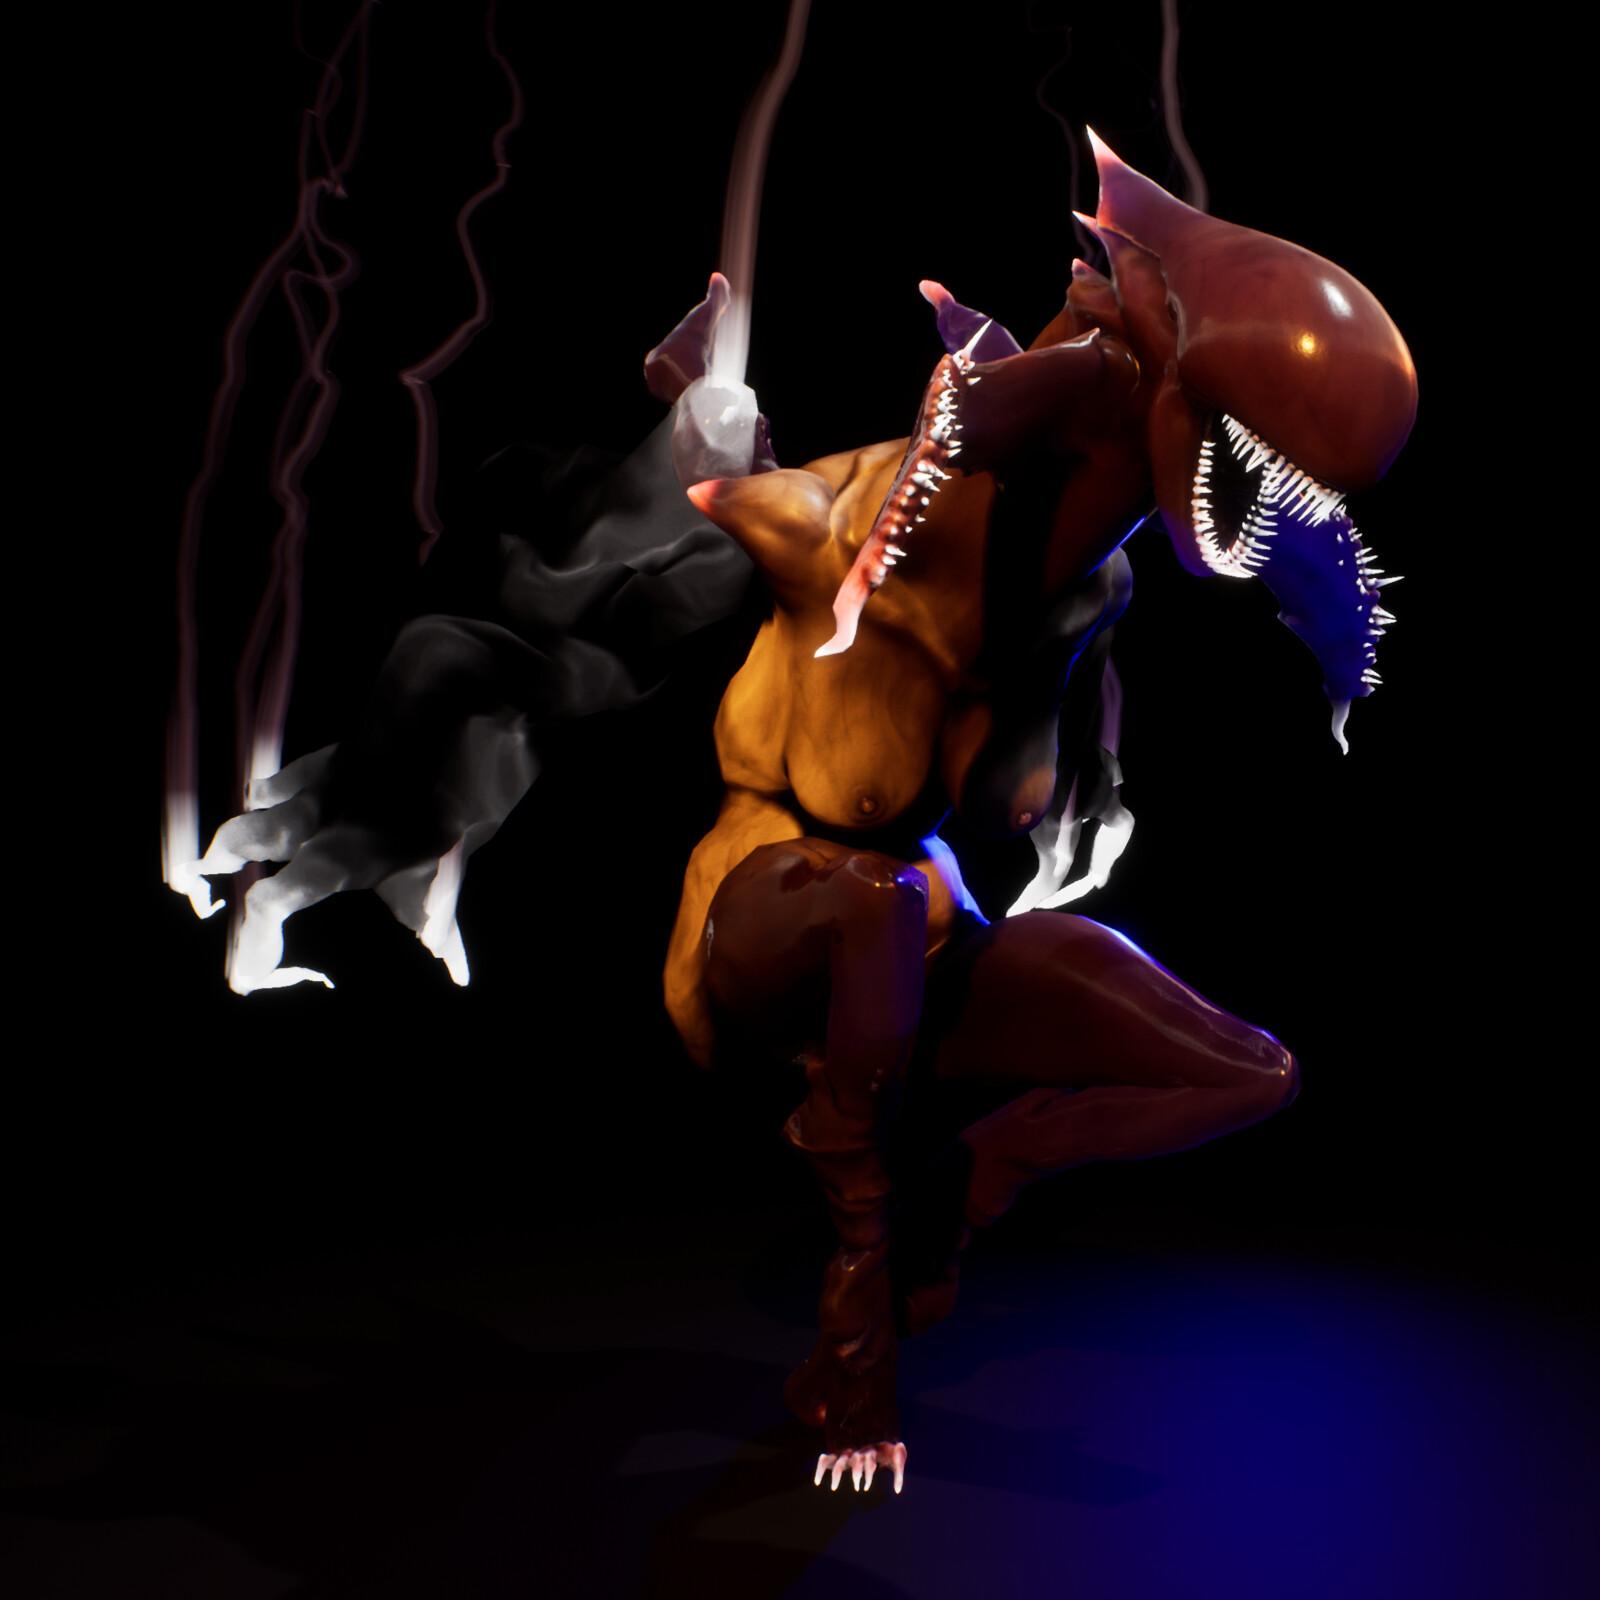 Smokey Finger - Unreal Engine 4 - Gameplay Animation